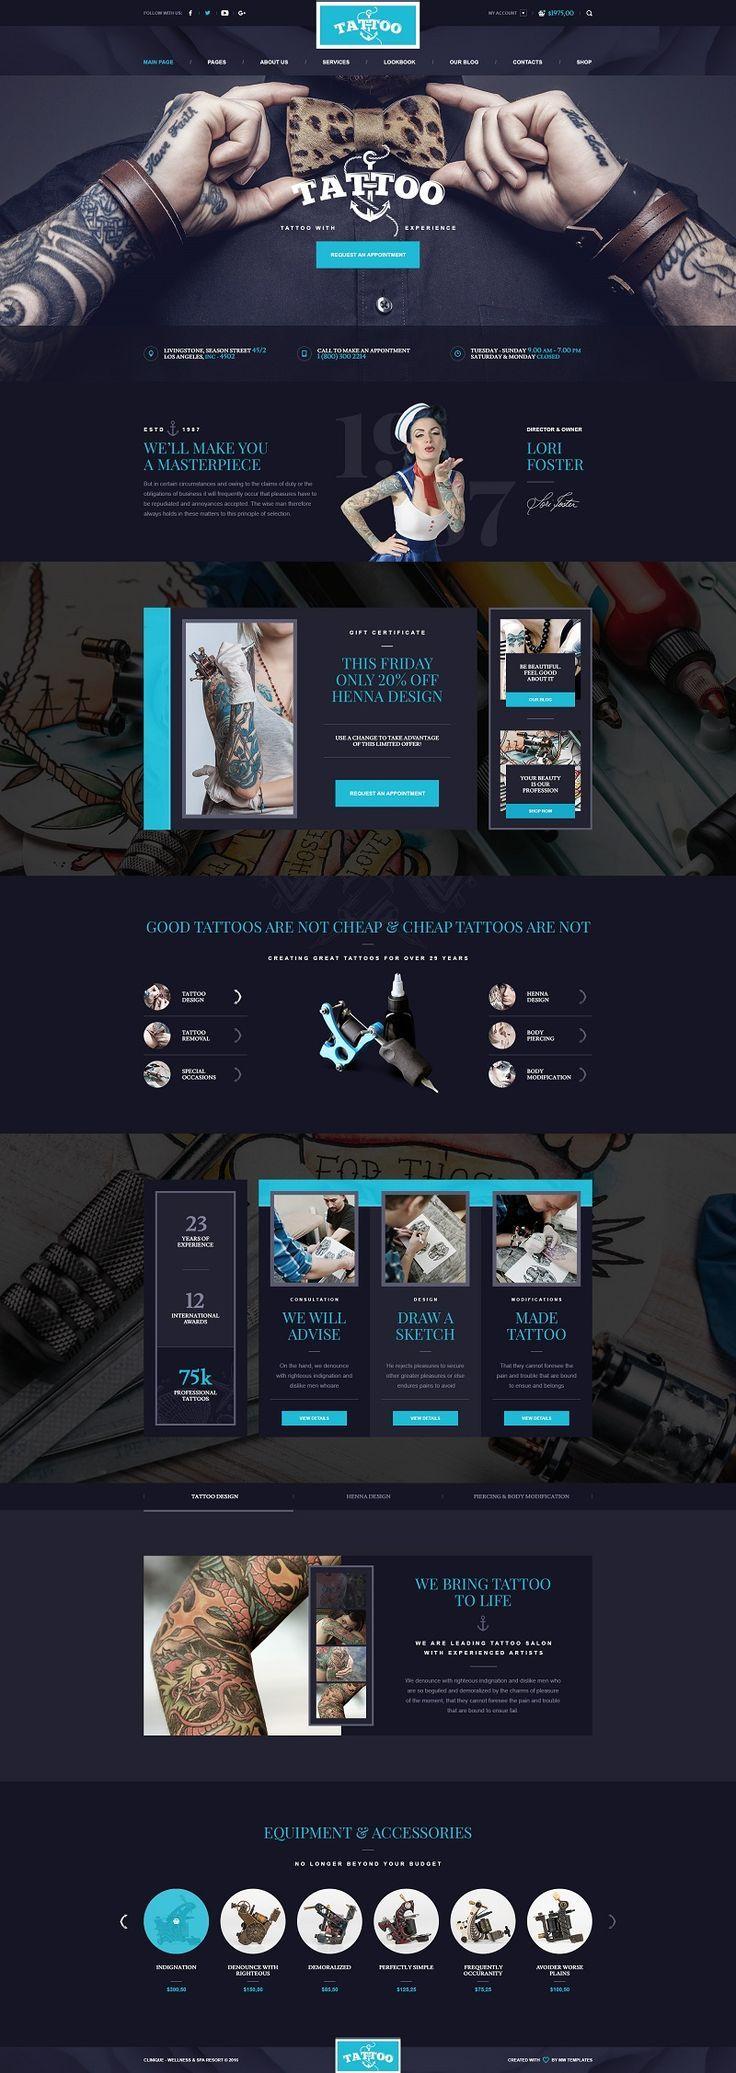 amazing 39 best web design images on pinterest website designs landing pages and mobile - Web Page Design Ideas